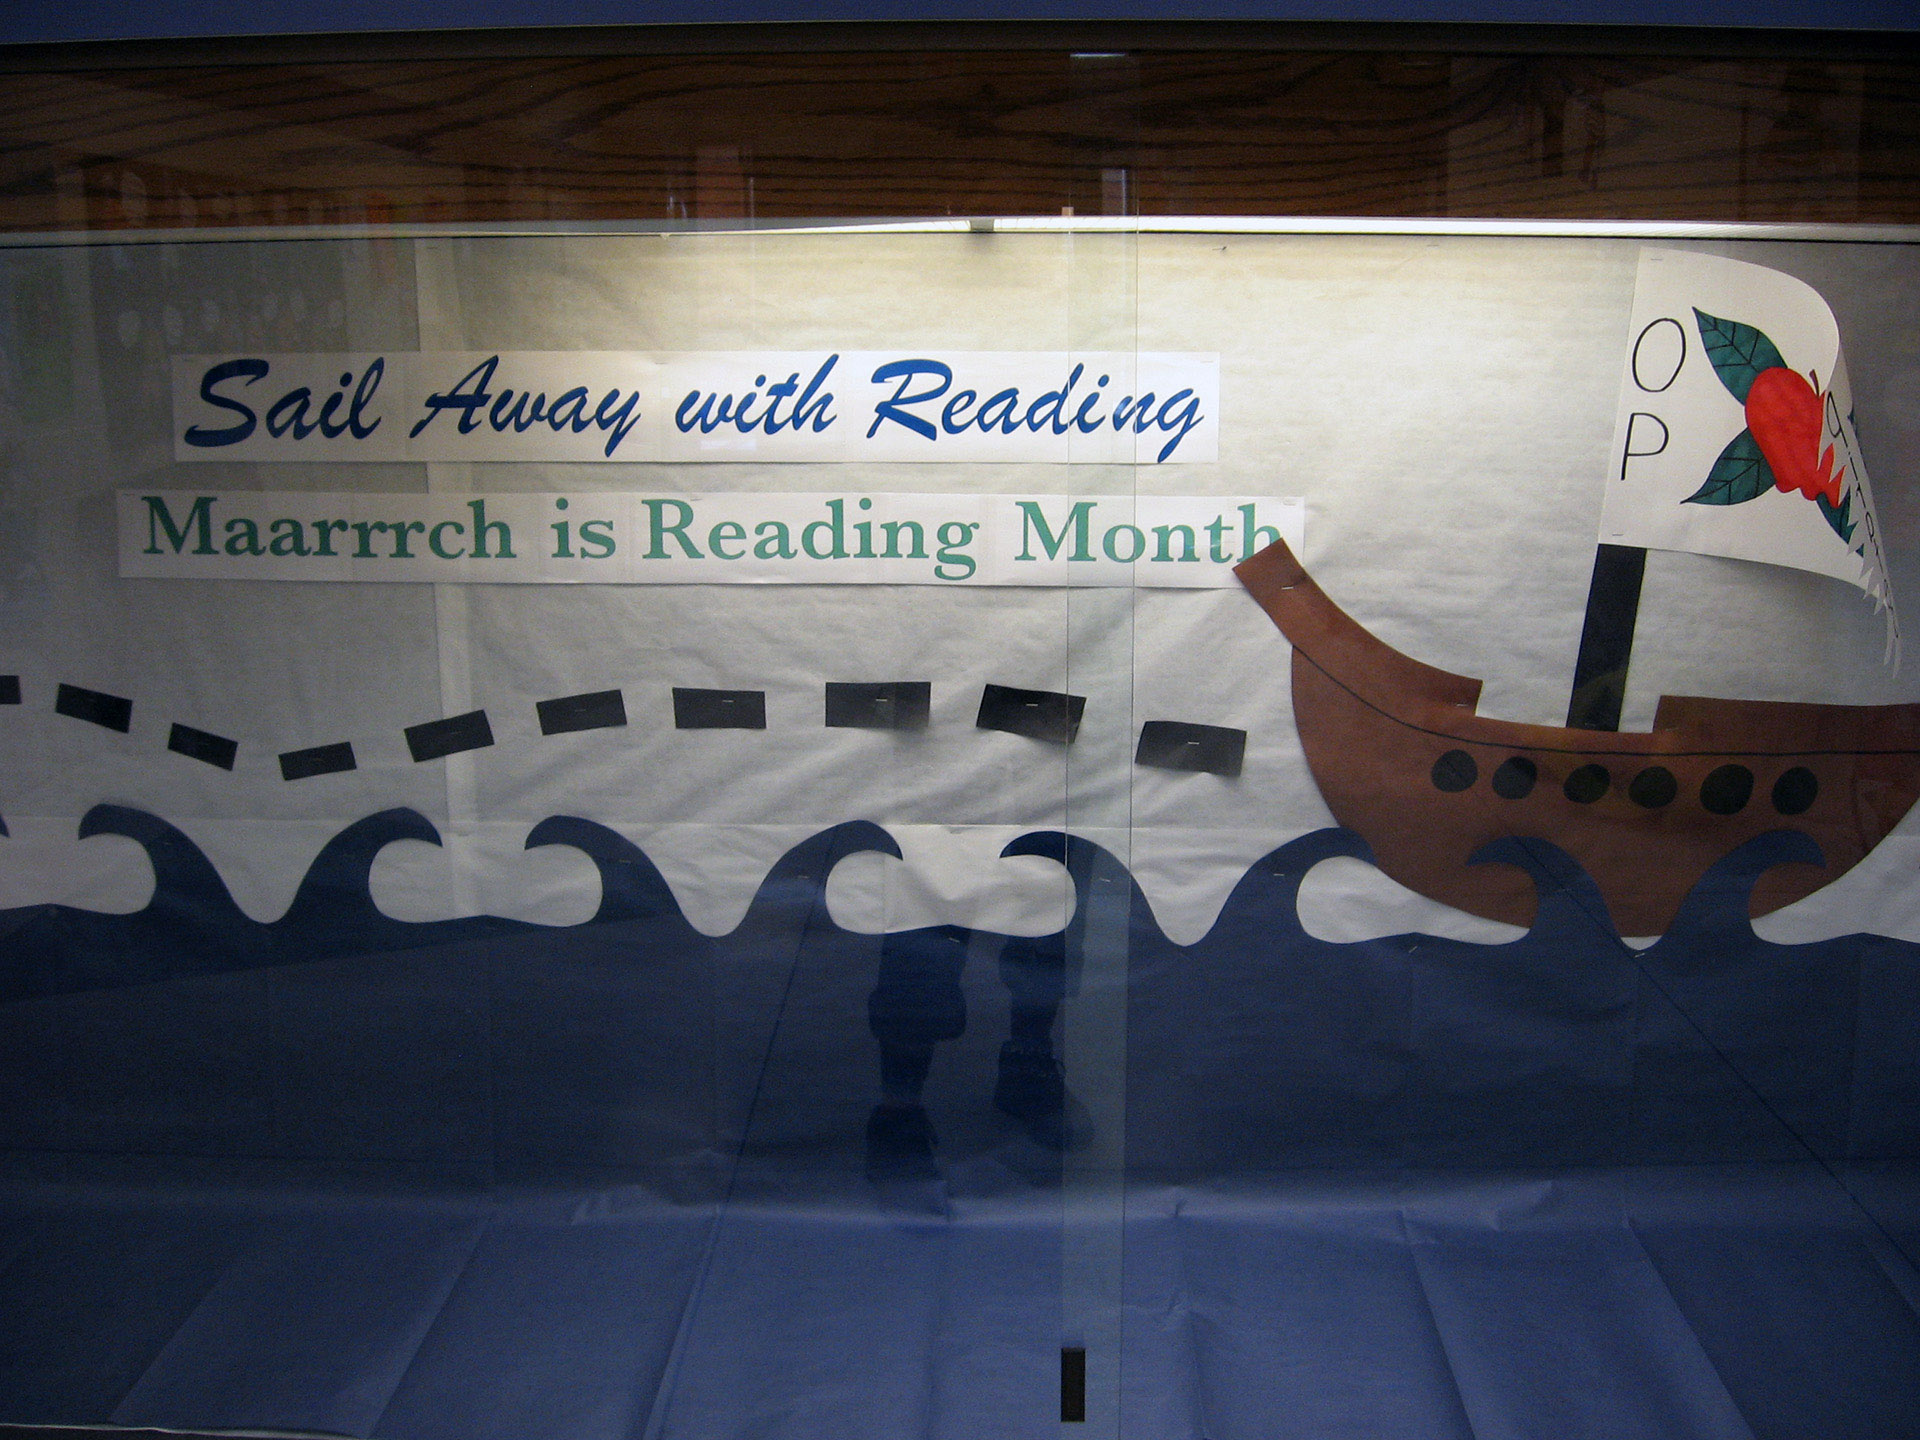 Marrrrrch is Reading Month